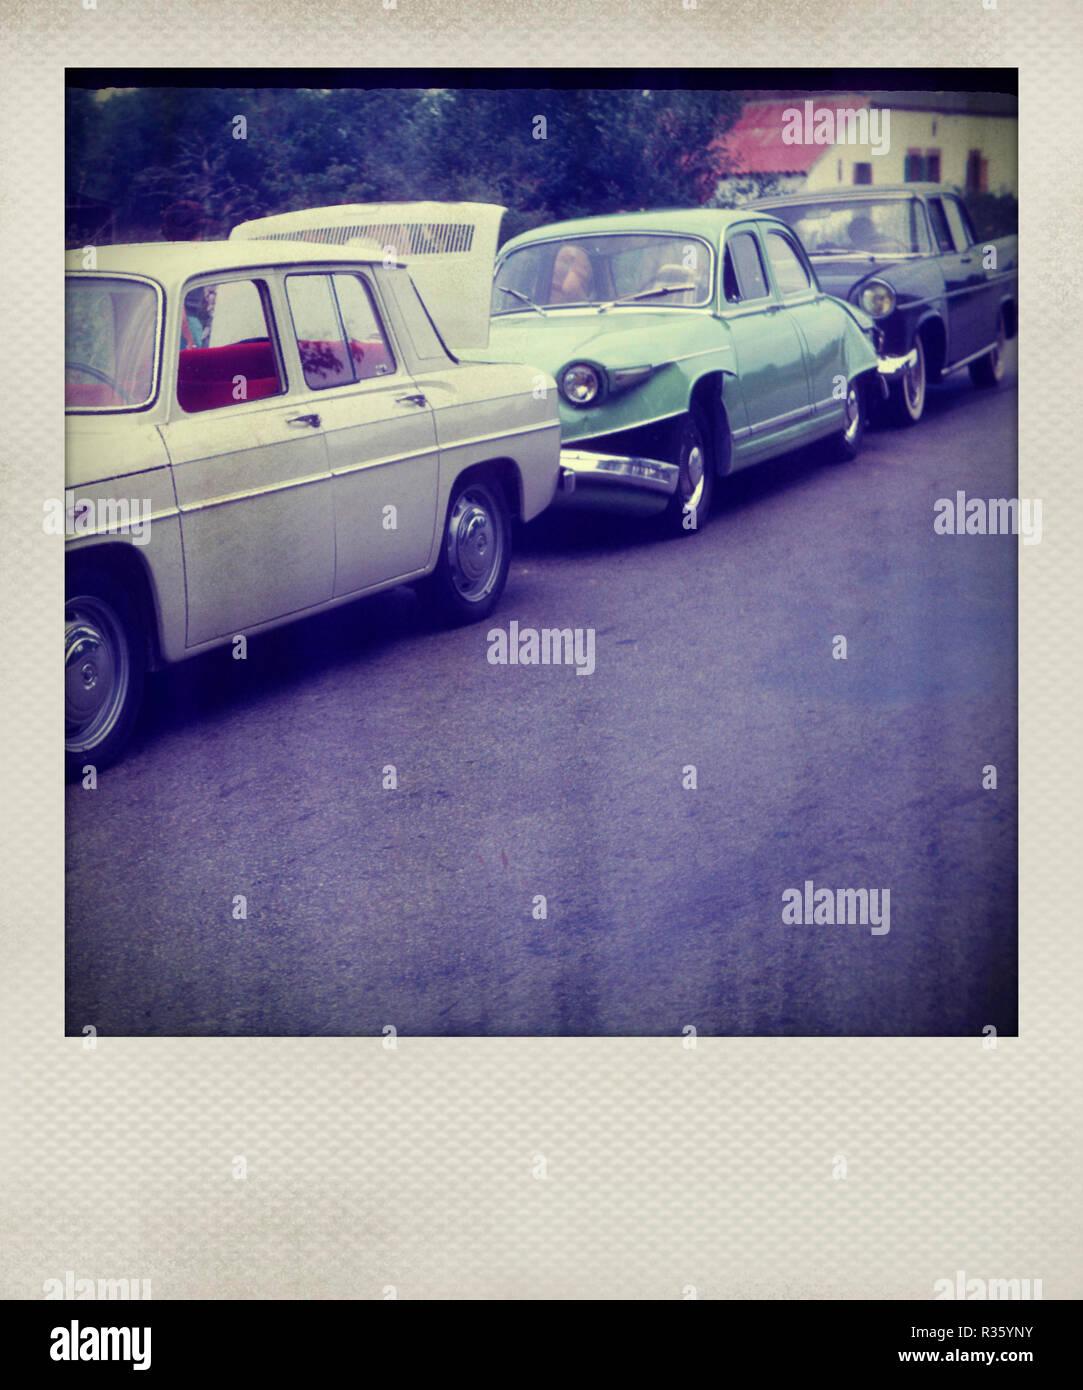 Polaroid effect of vintage cars - Stock Image